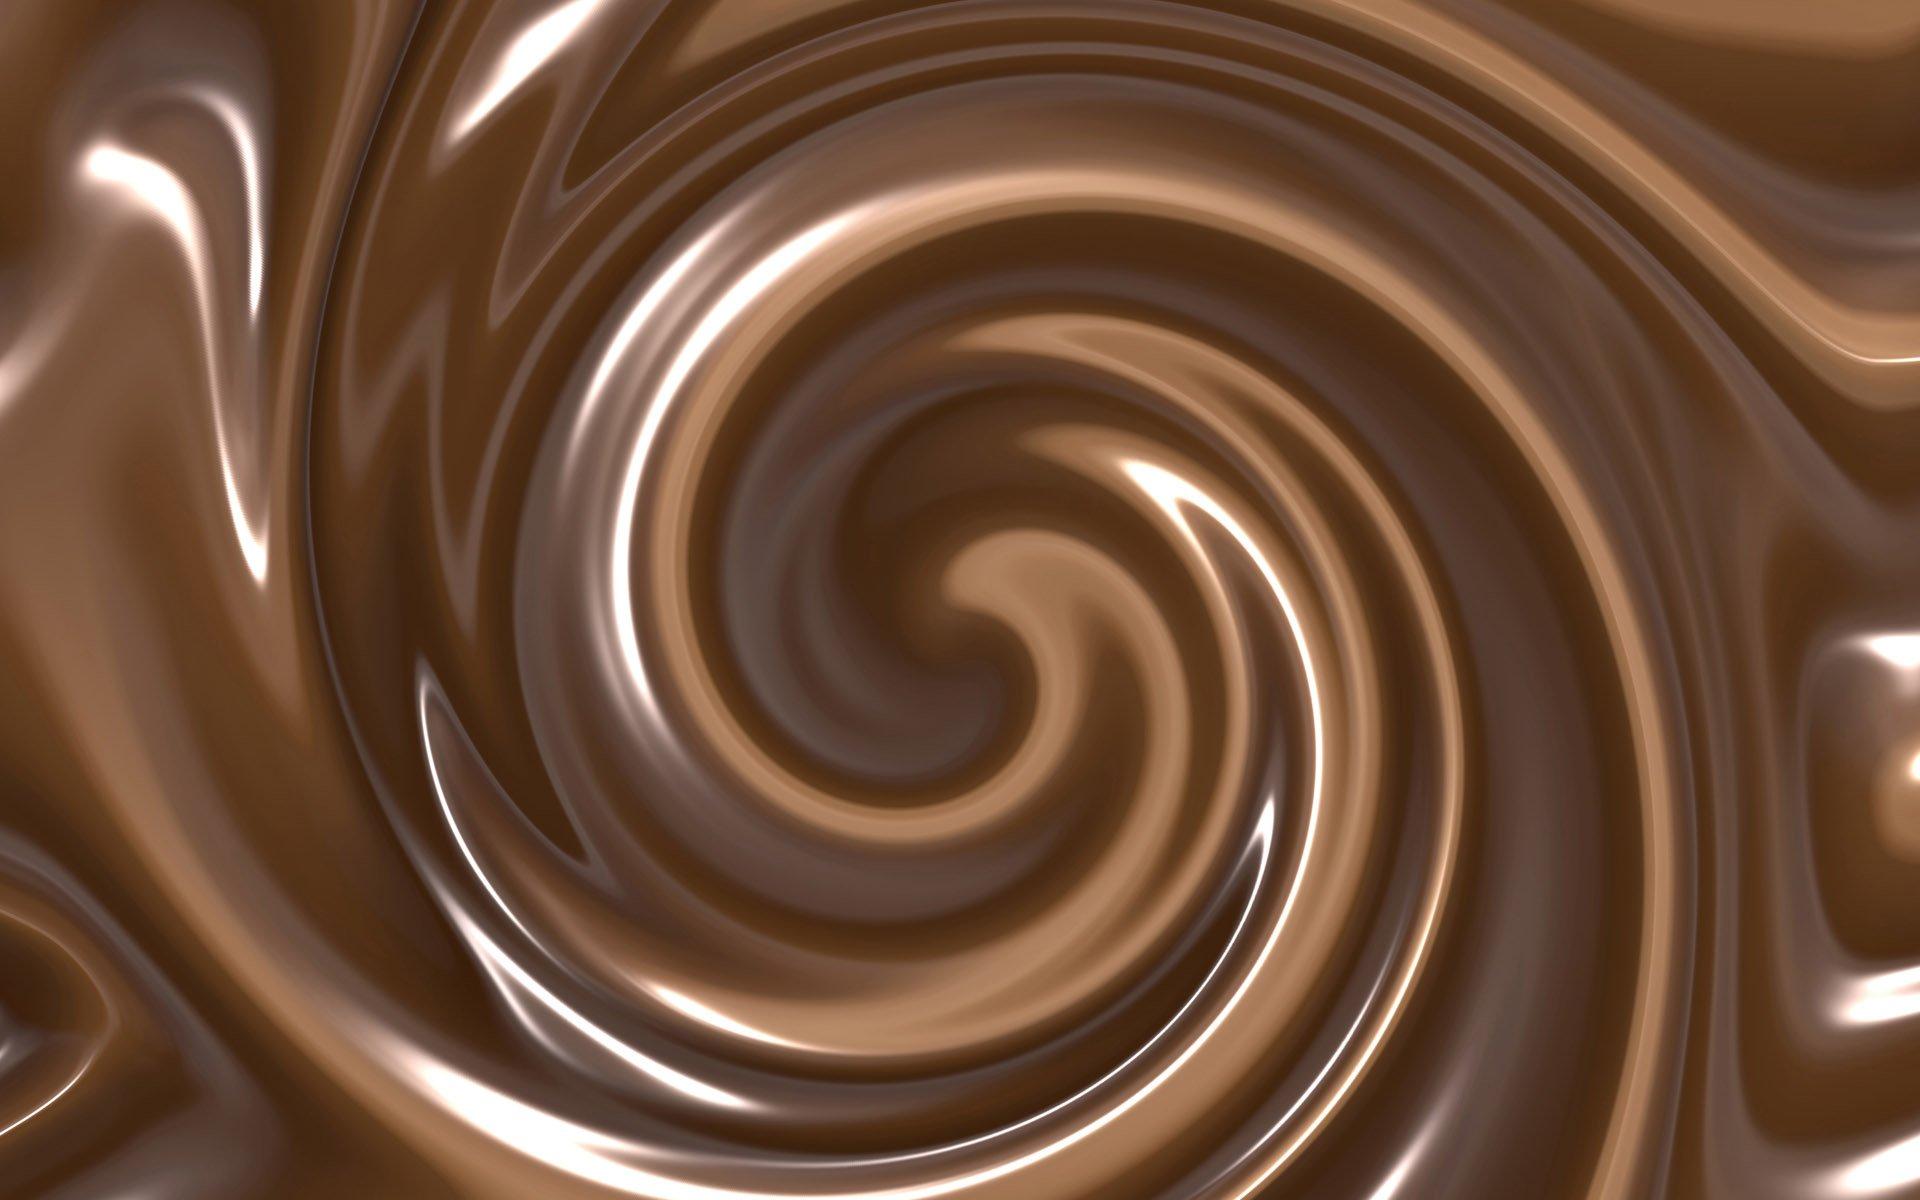 hinh nen chocolate 6